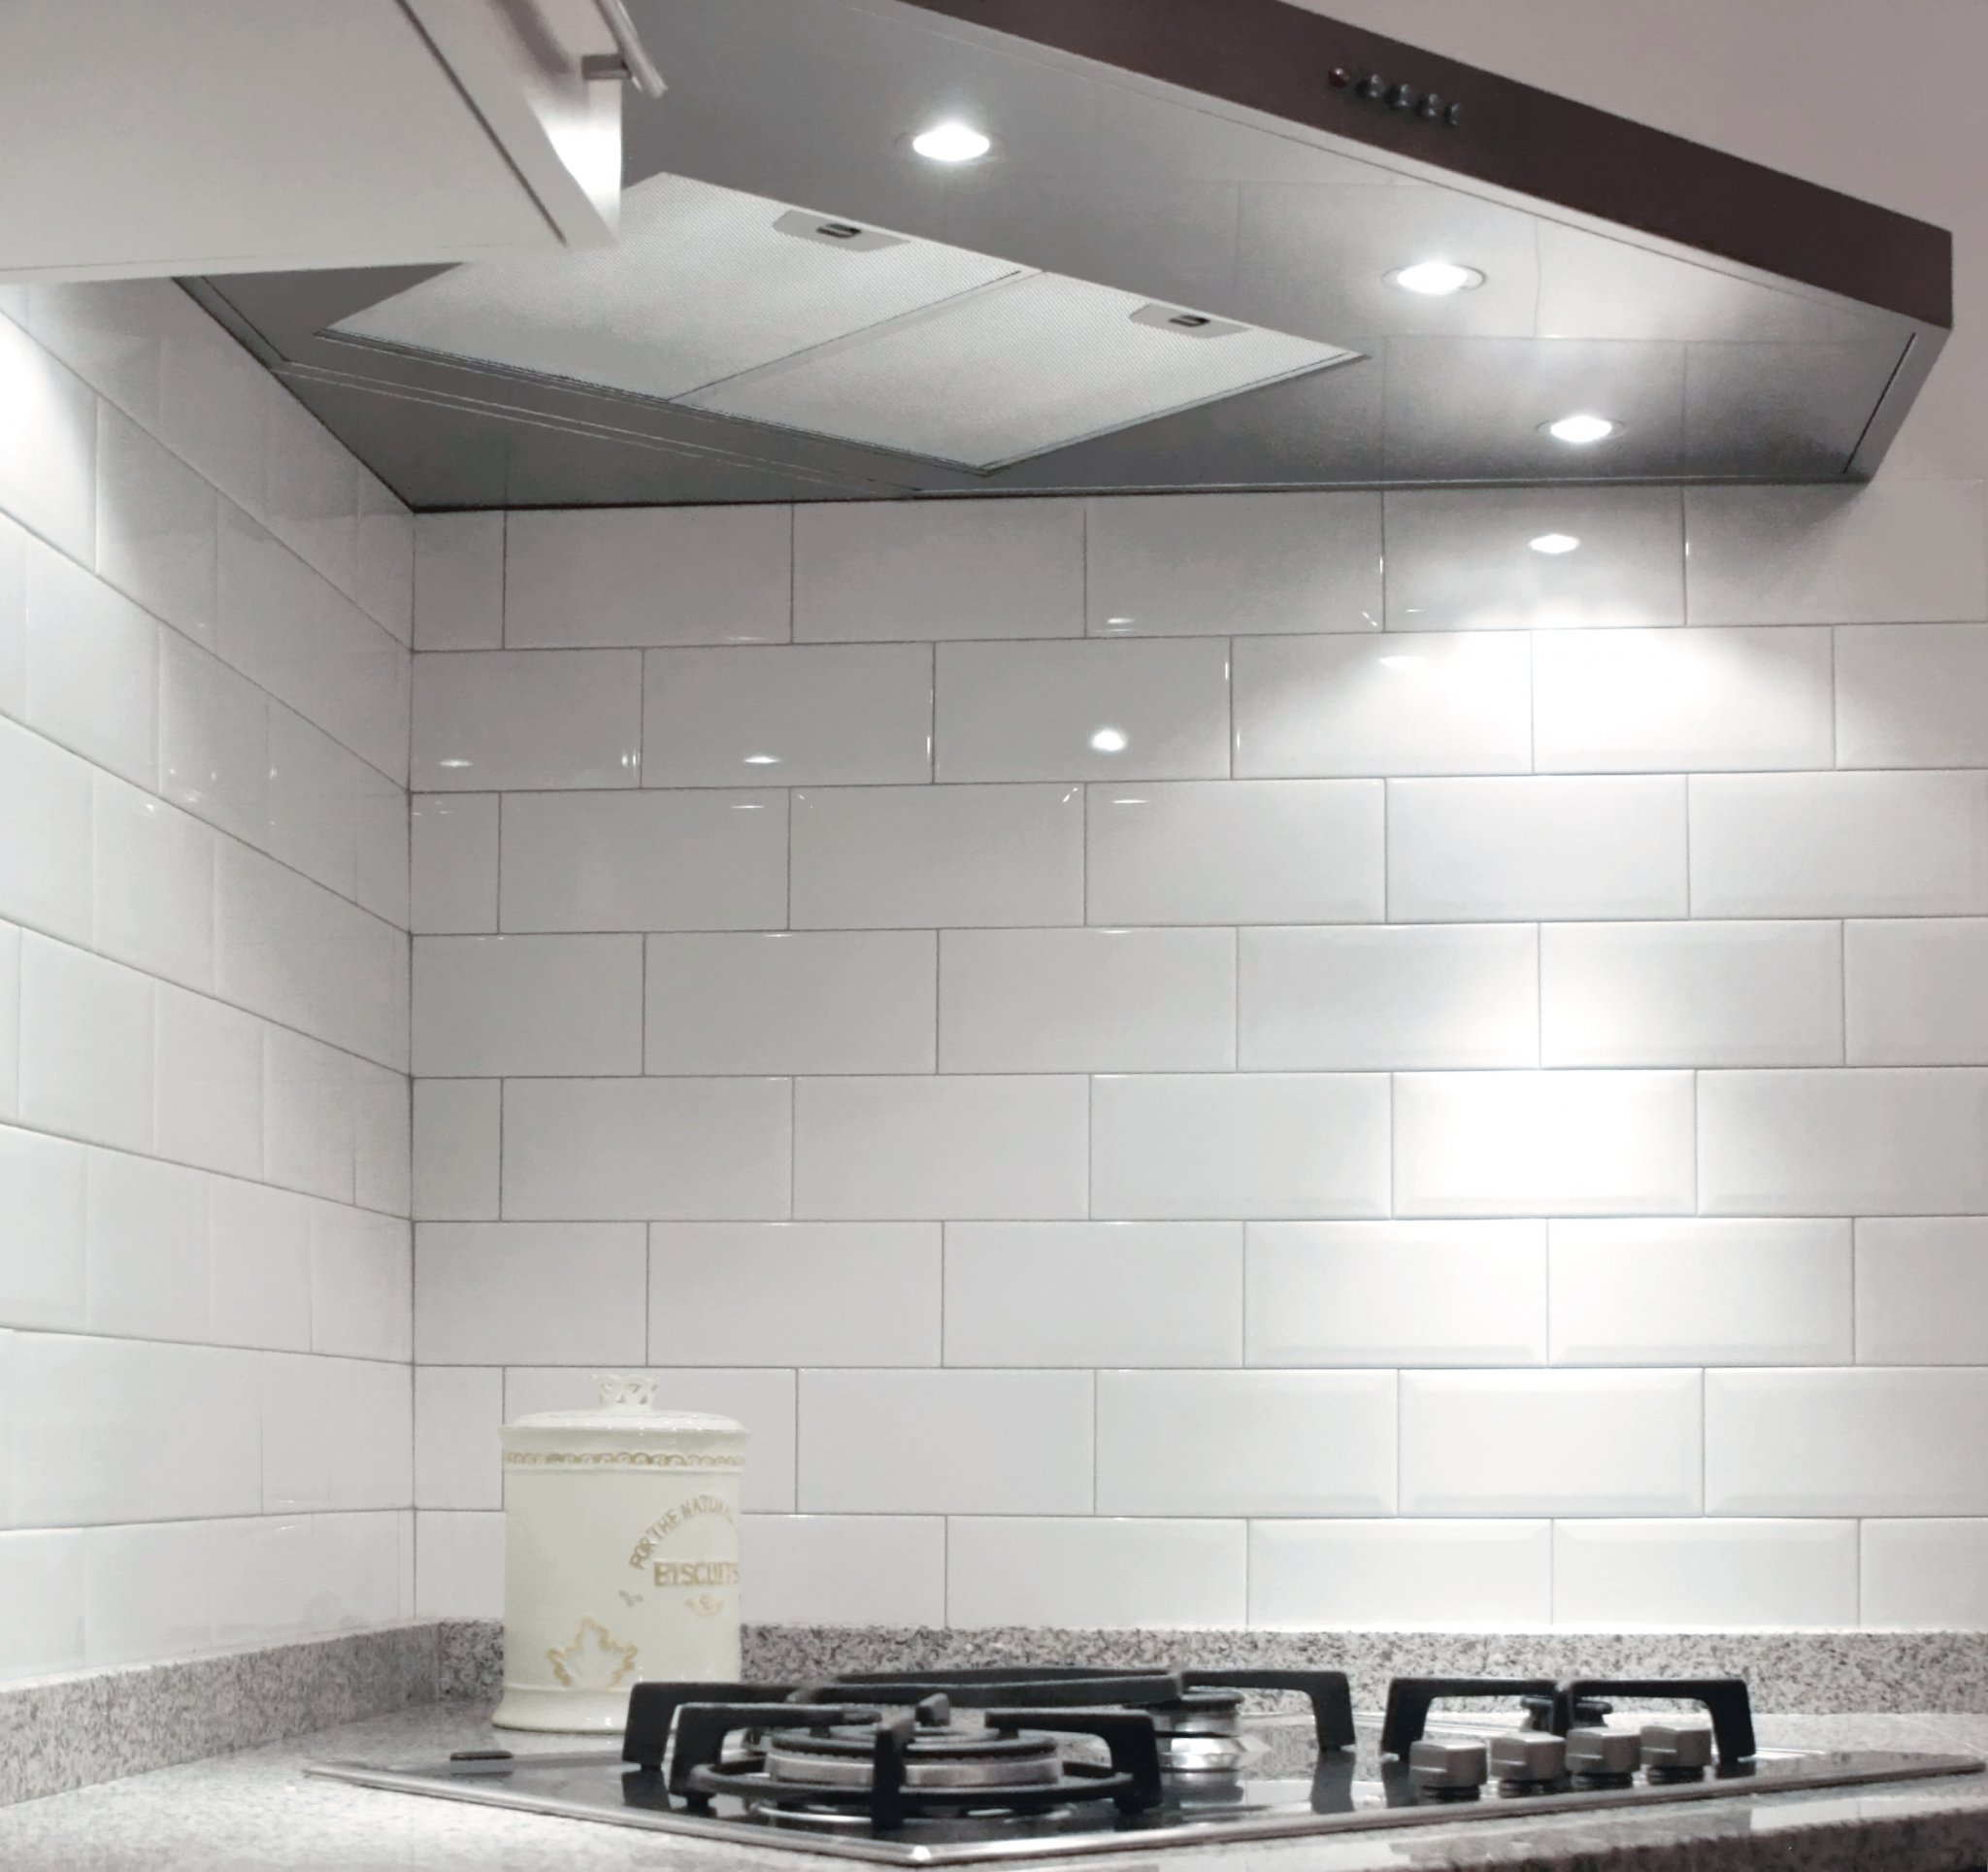 diamante rivestimento cucina bianco mosaico 2 - Moda Ceramica